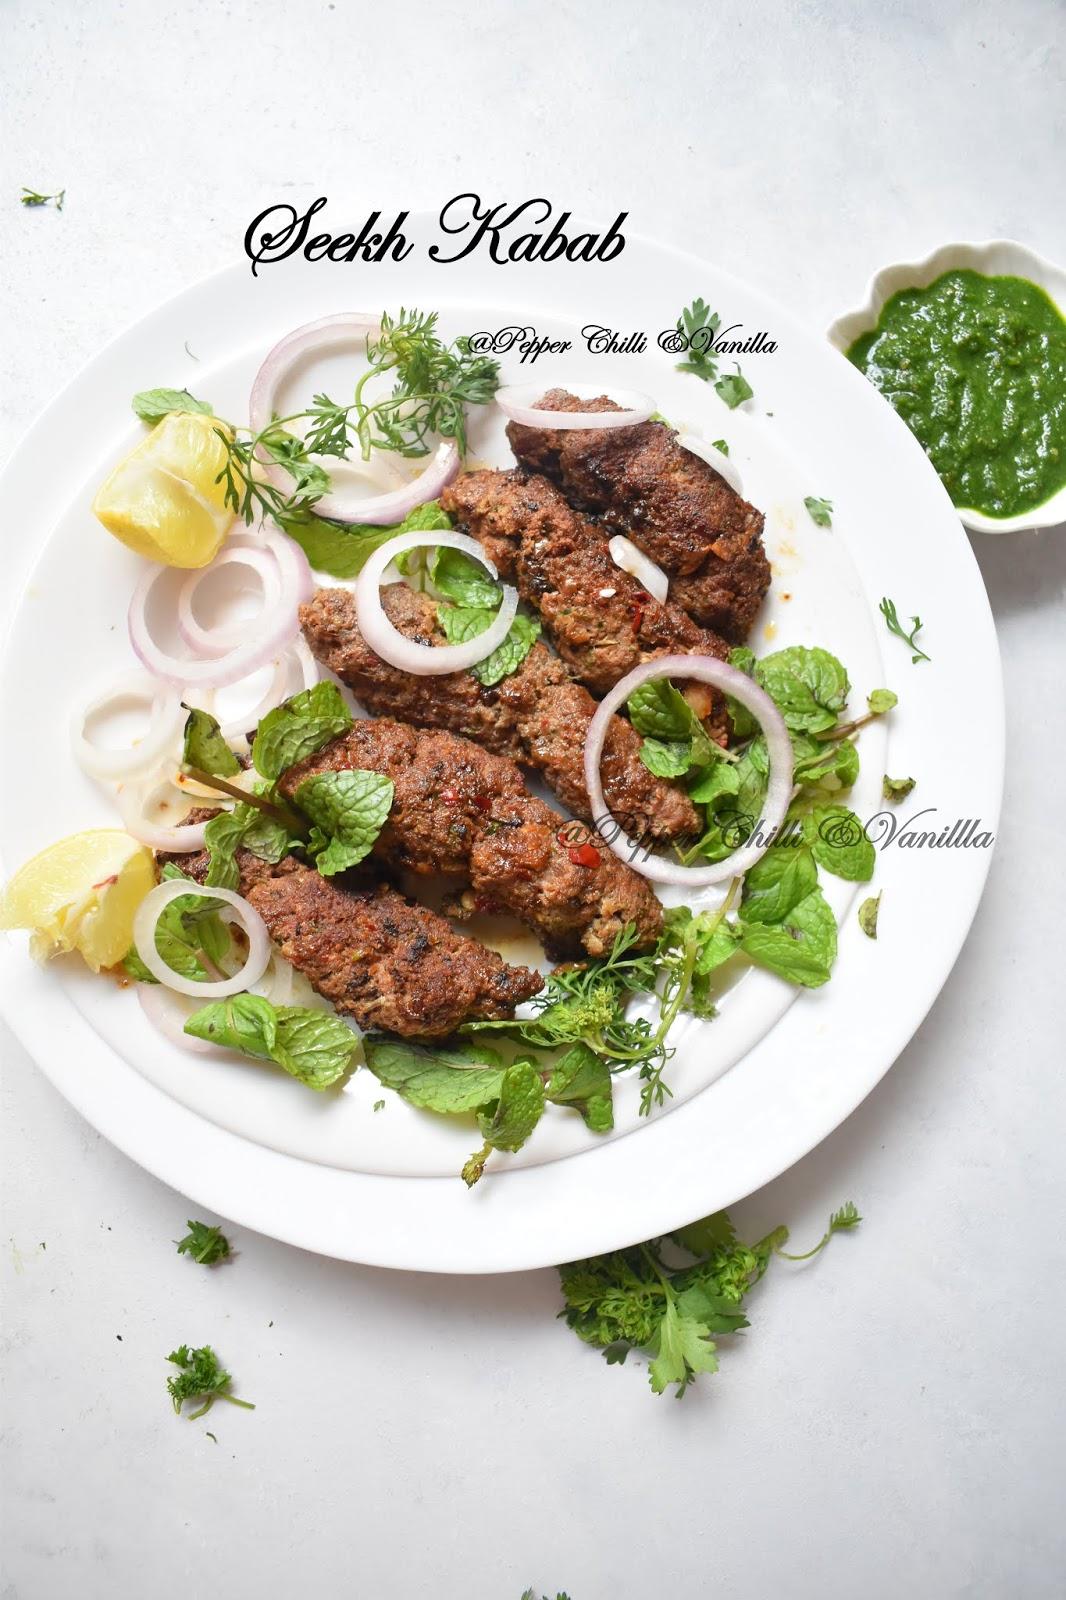 how to make seekh kabab/seekh kabab